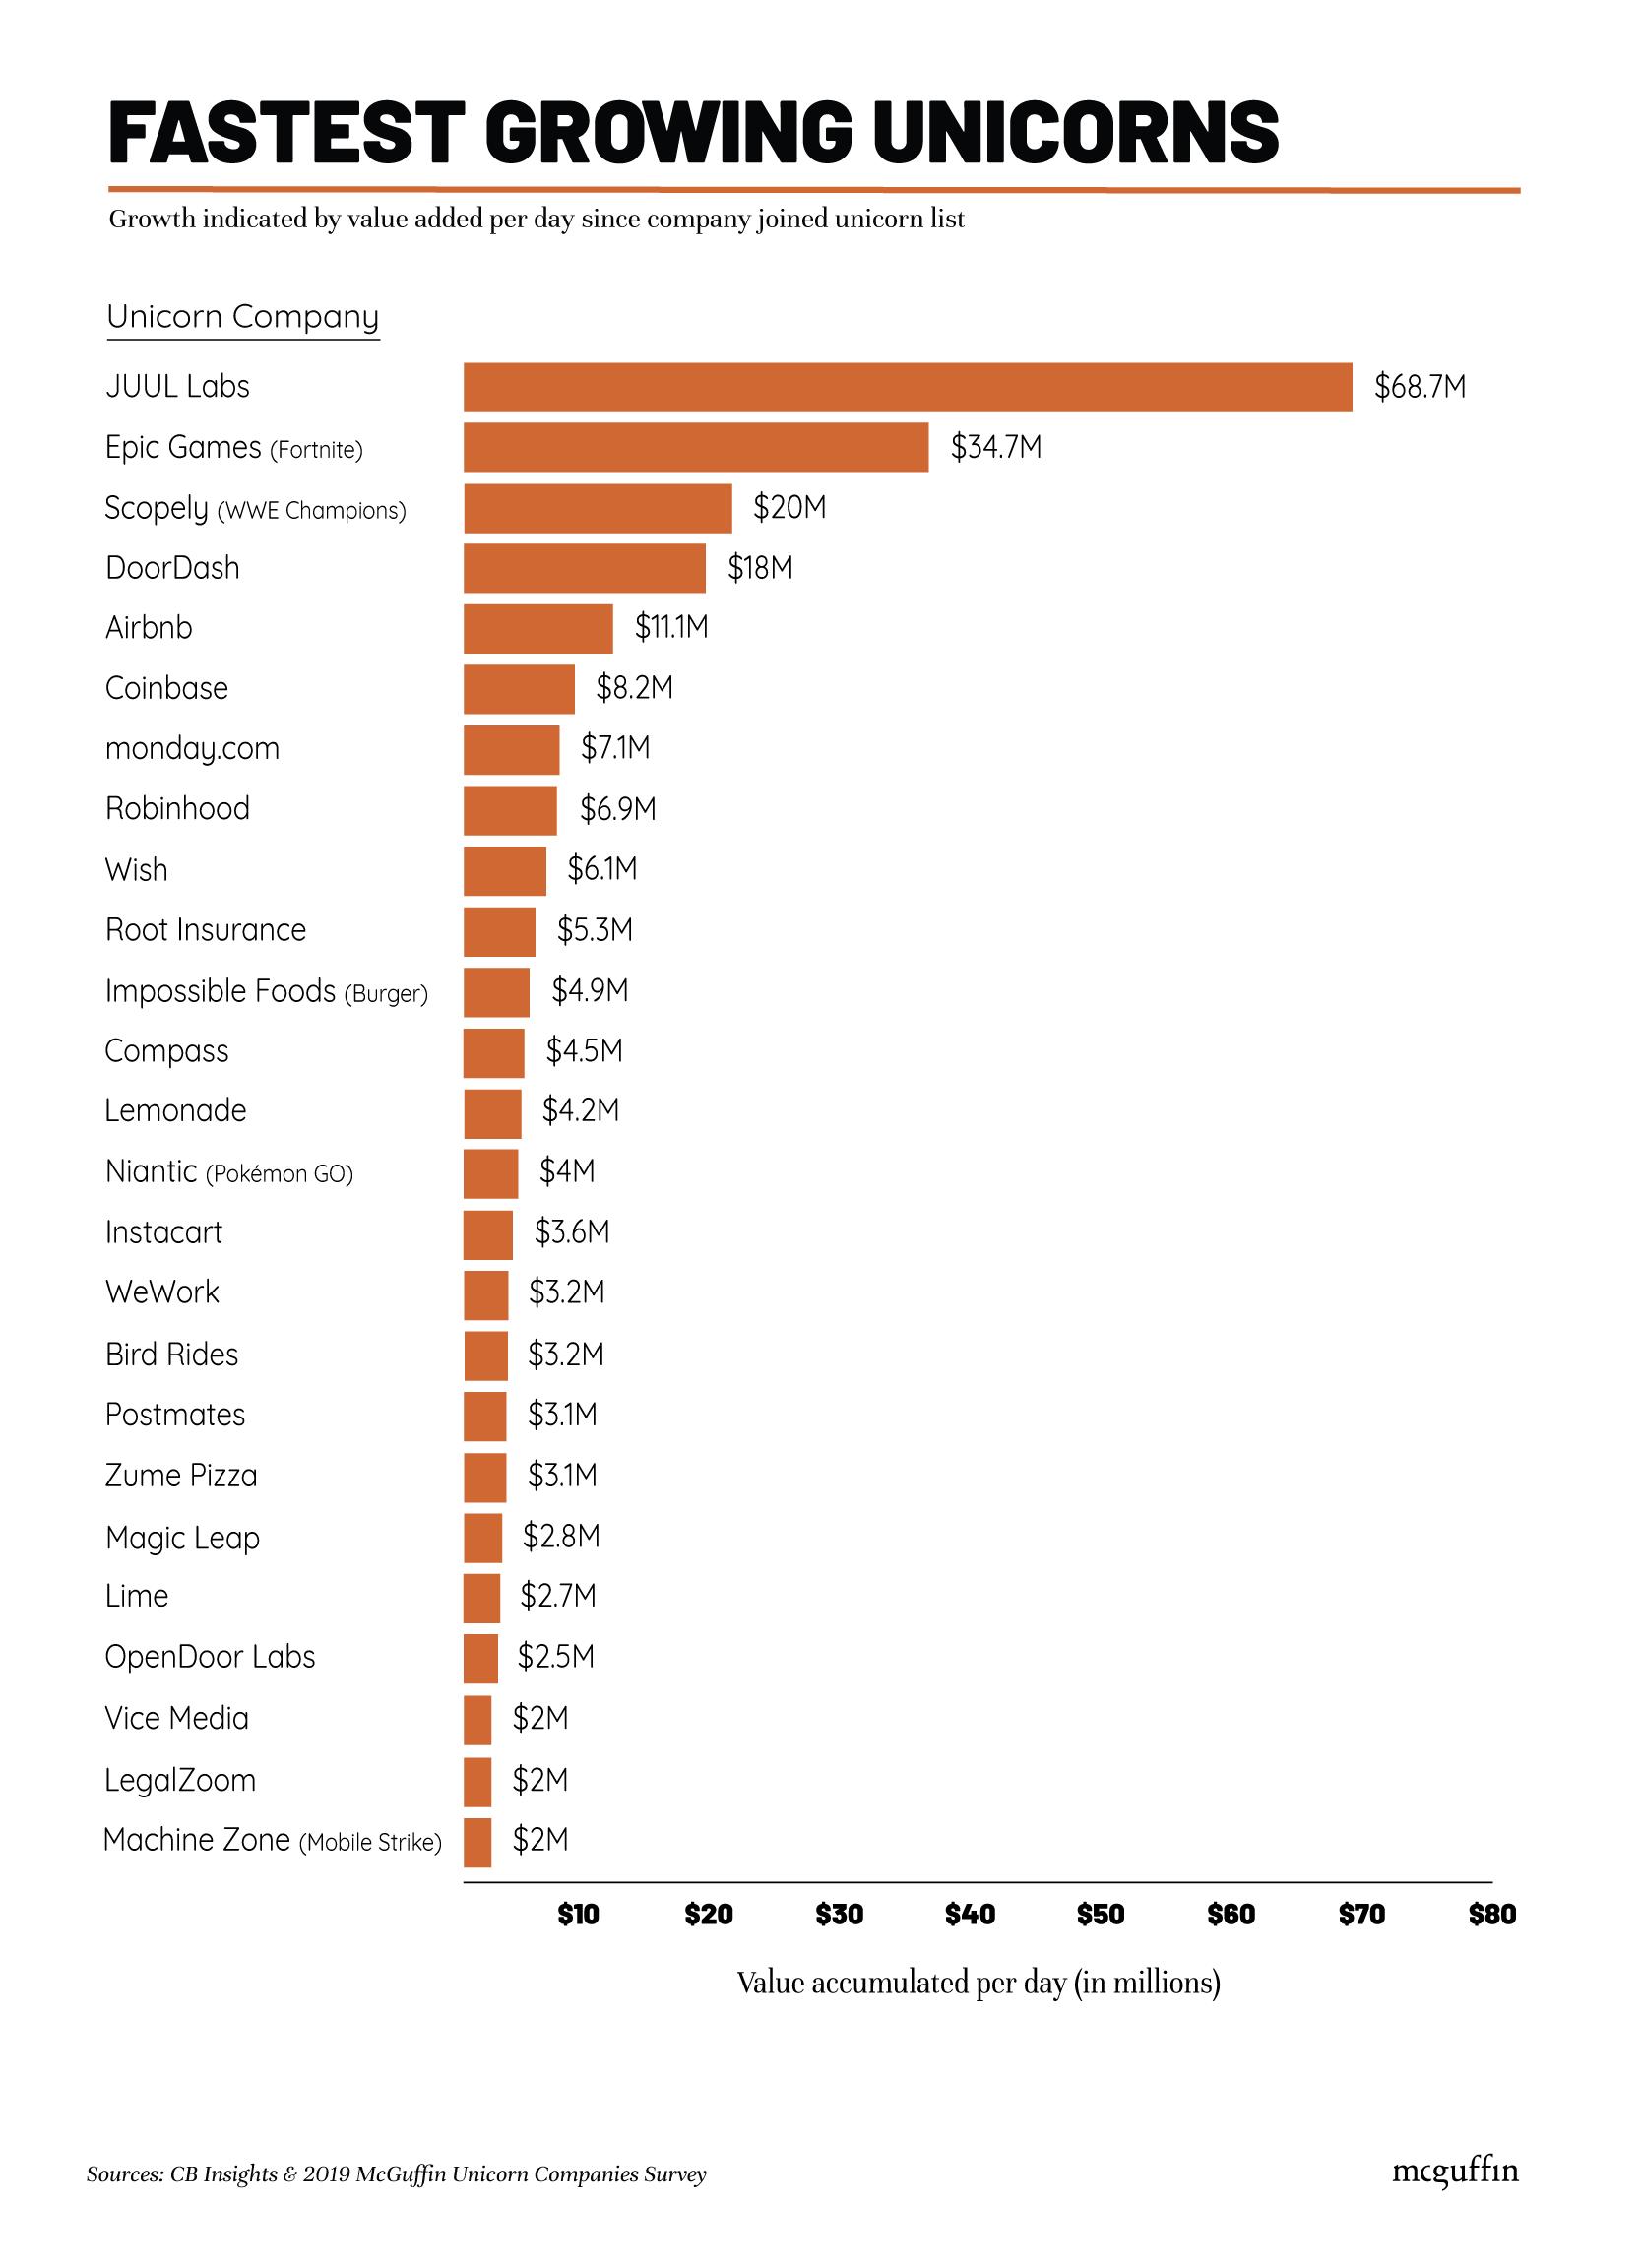 Fastest growing unicorn companies